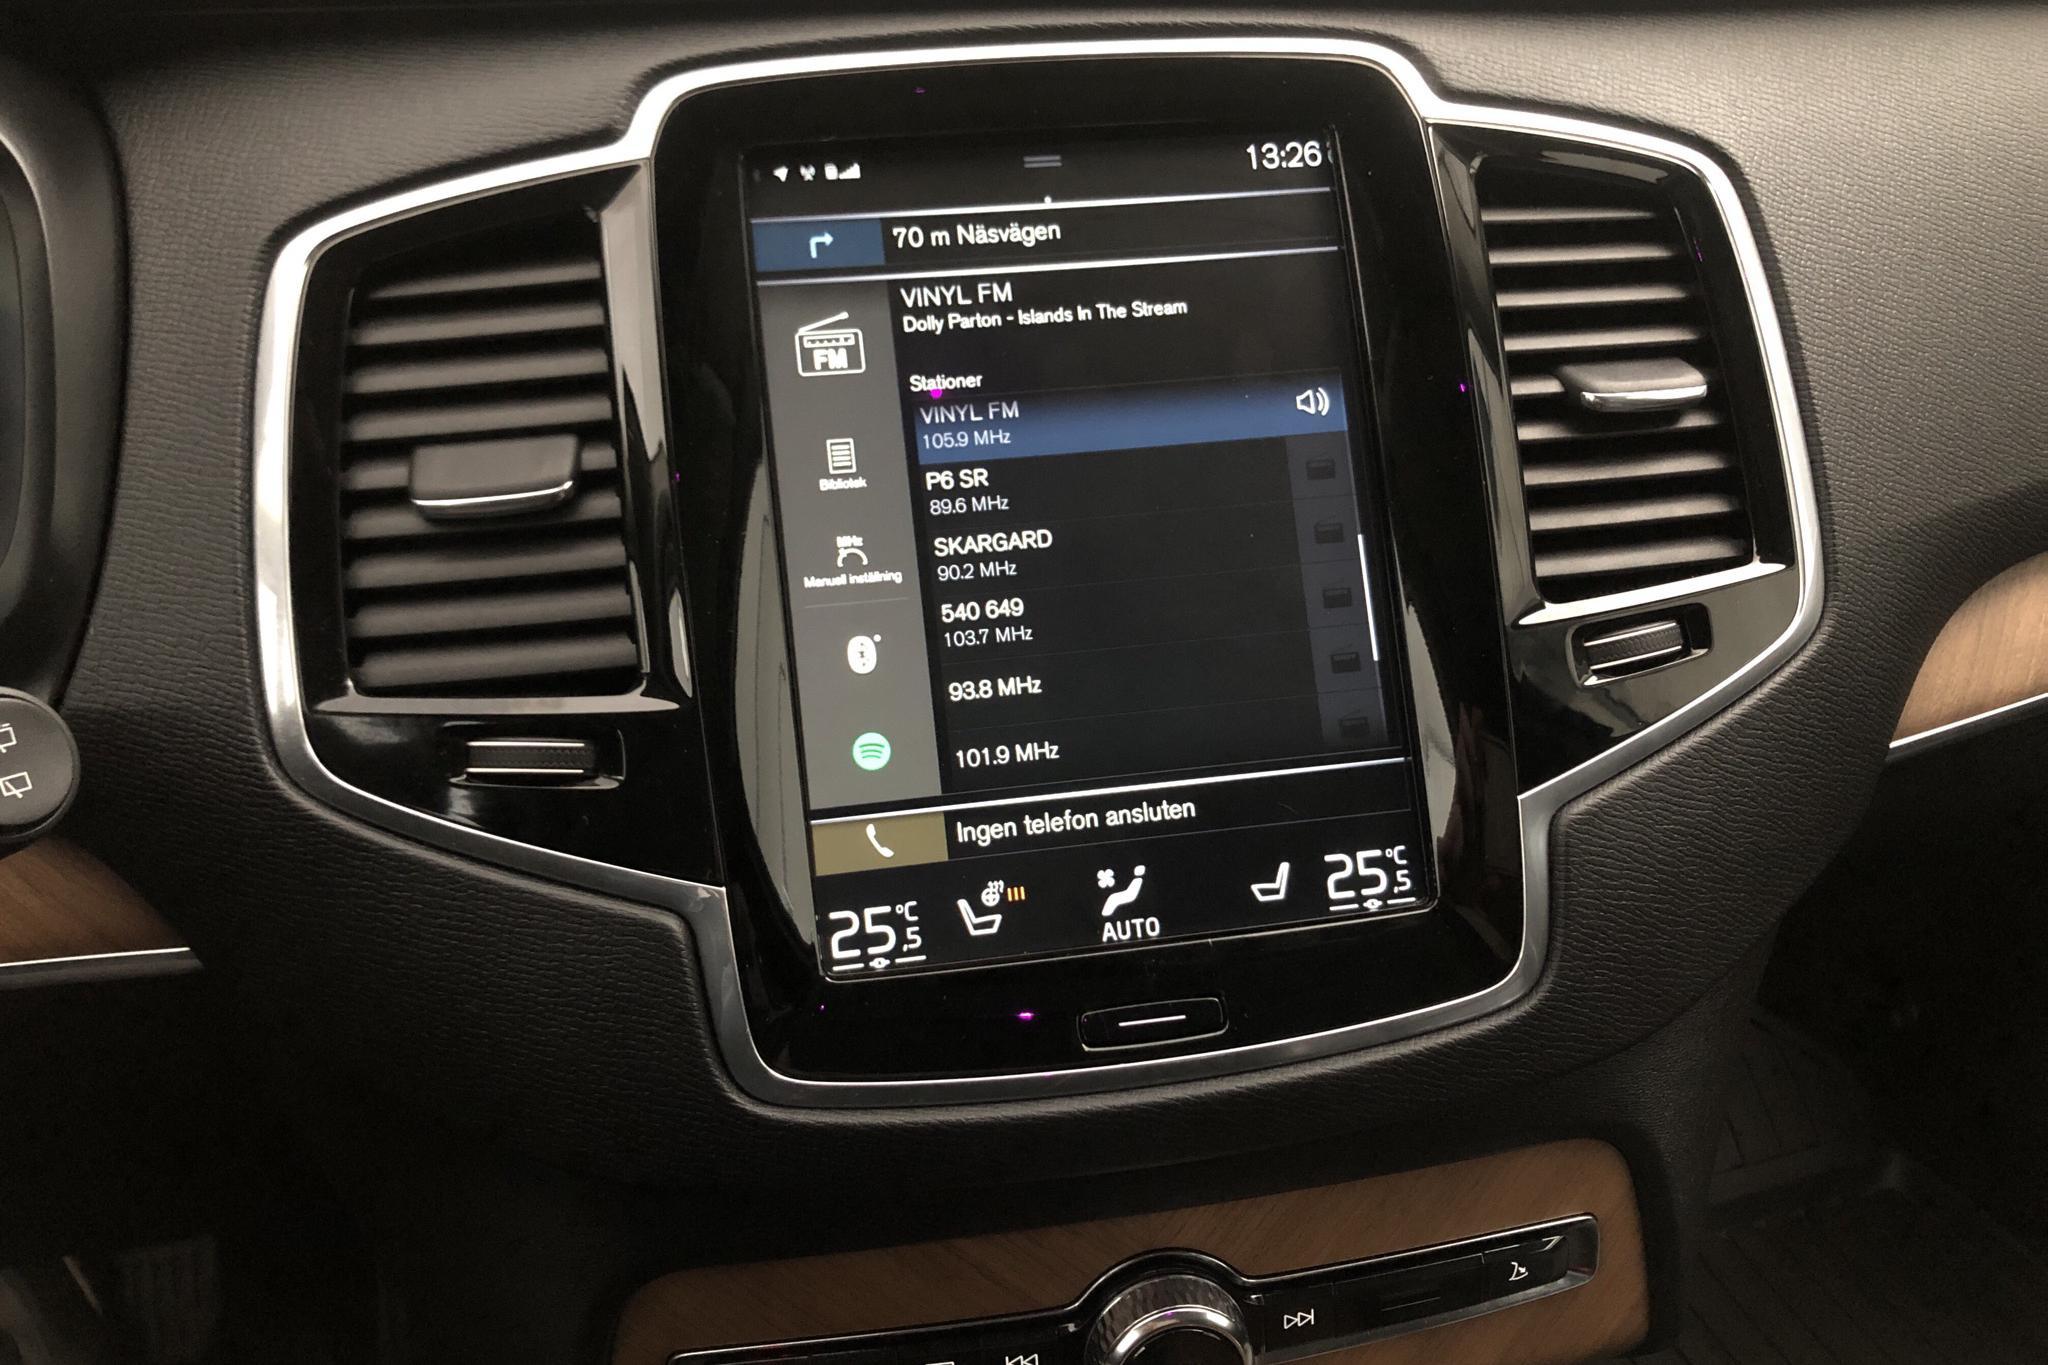 Volvo XC90 D4 AWD (190hk) - 57 970 km - Automatic - gray - 2018